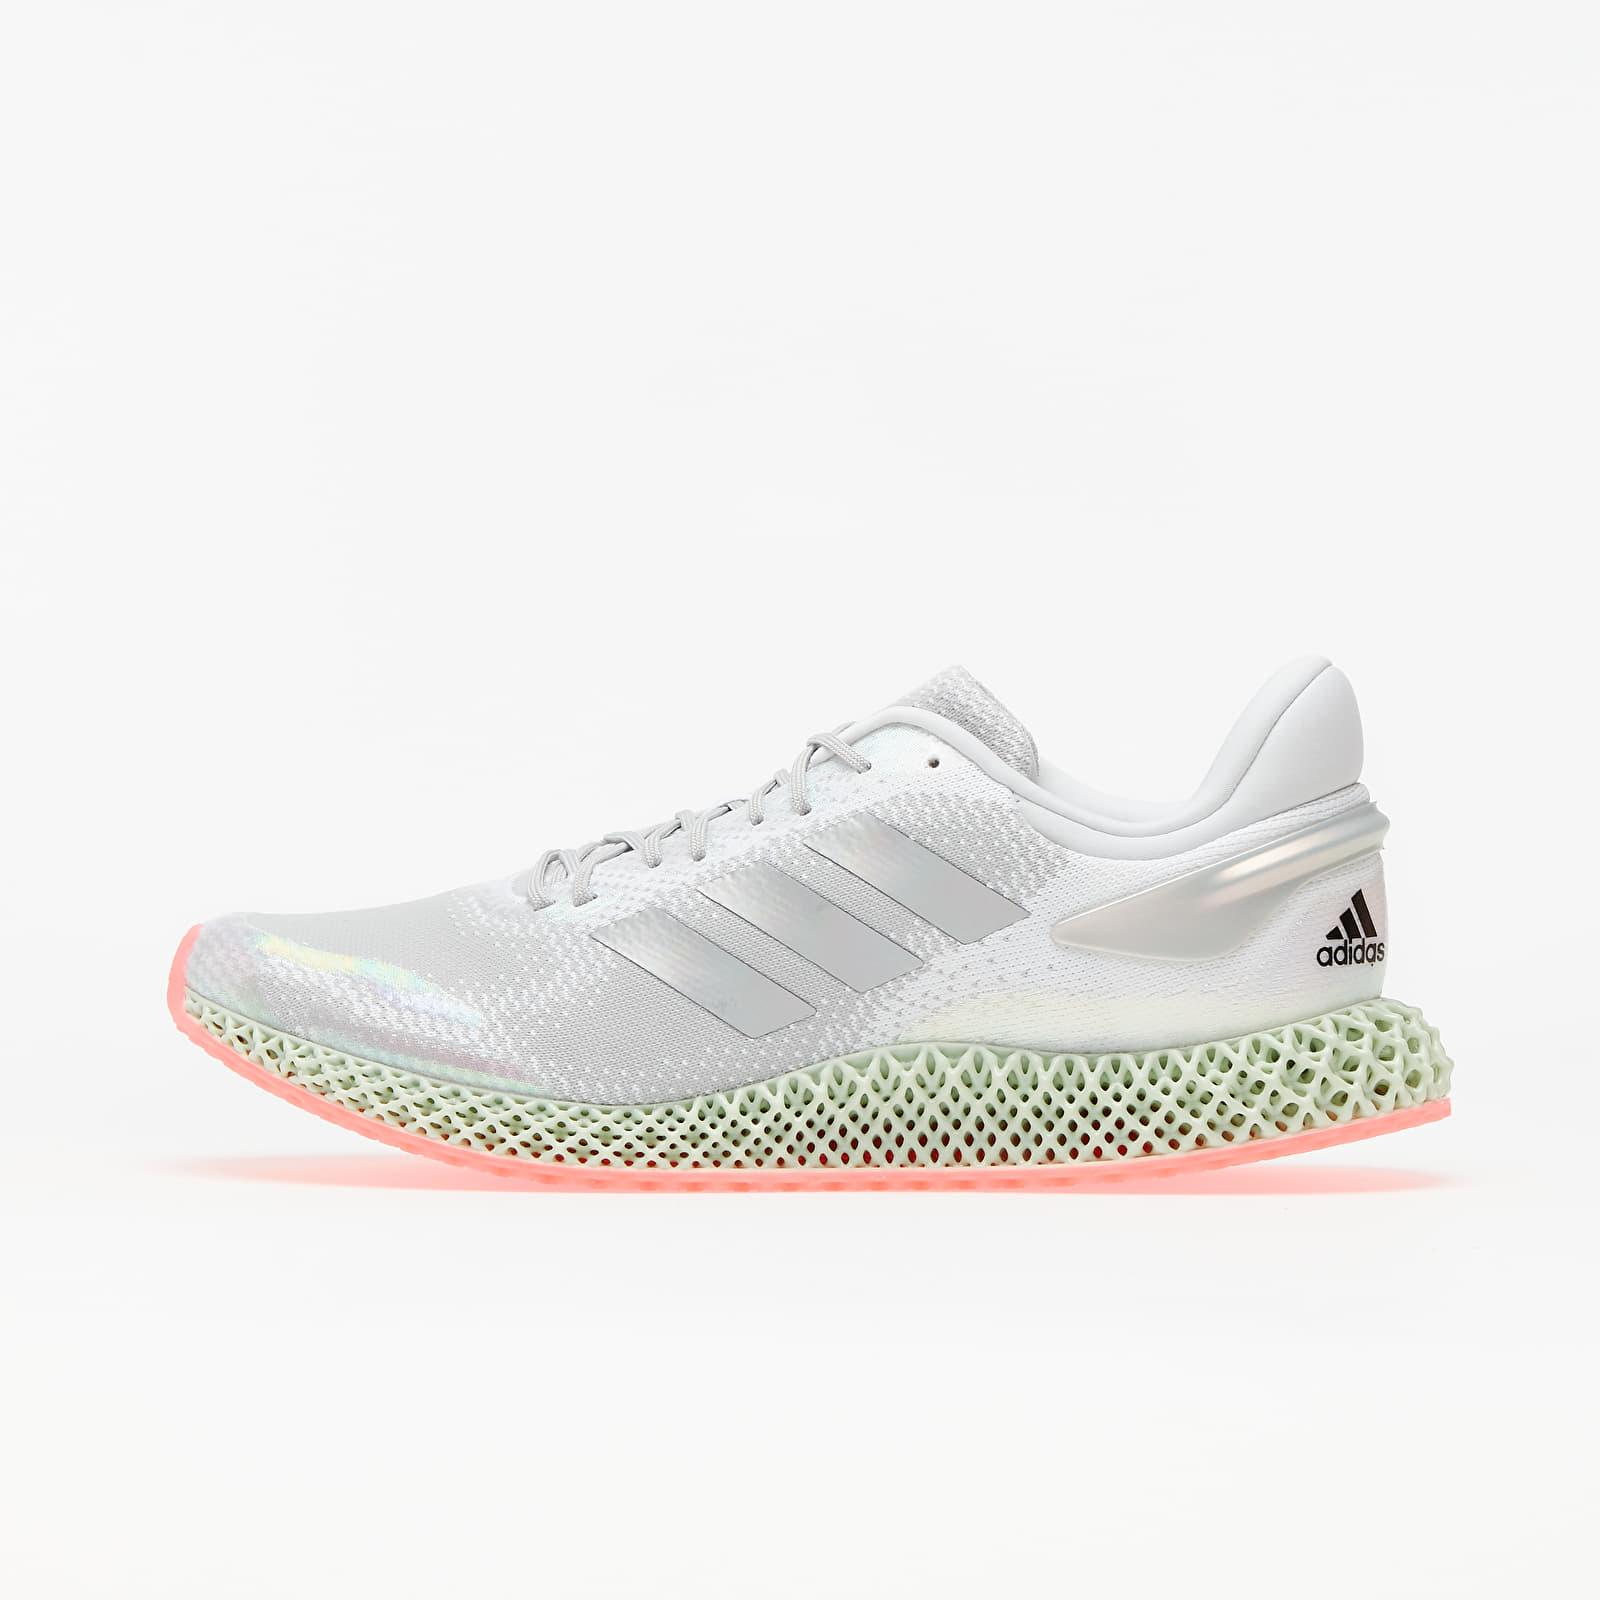 Pánske tenisky a topánky adidas 4D Run 1.0 Ftw White/ Silver Metalic/ Signature Pink